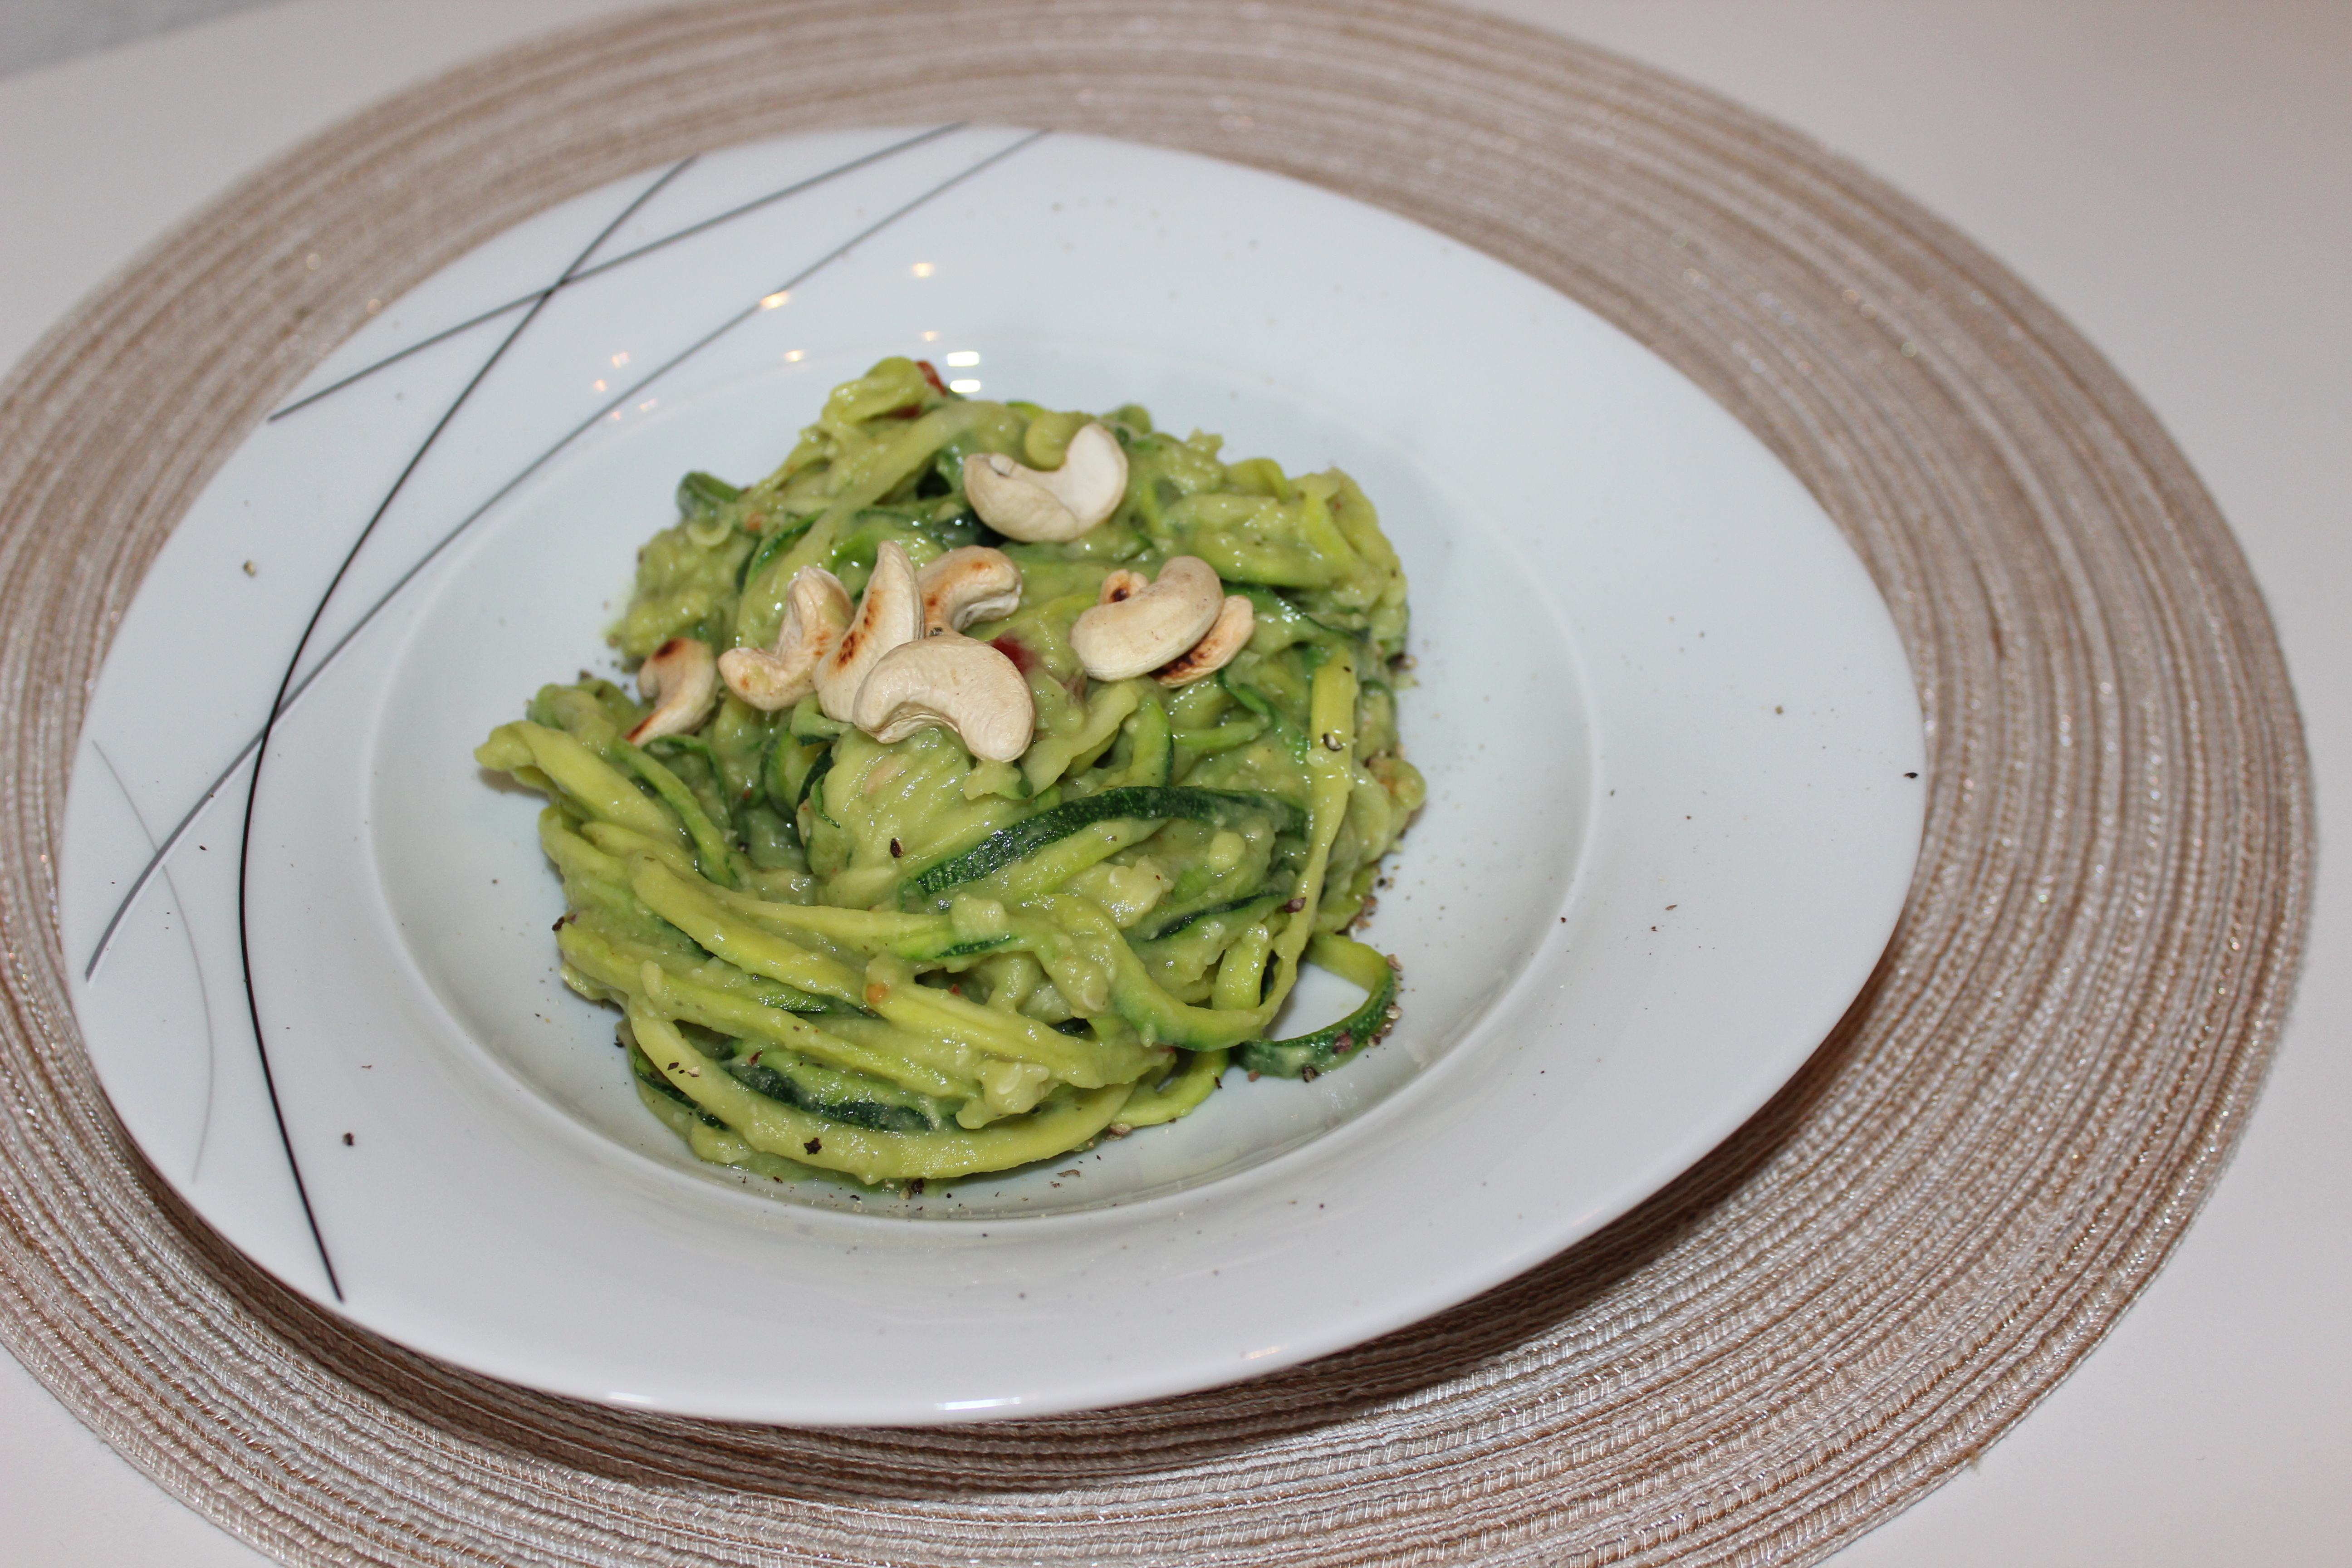 rezept zucchini nudeln mit avocado cashew pesto hebmamis. Black Bedroom Furniture Sets. Home Design Ideas